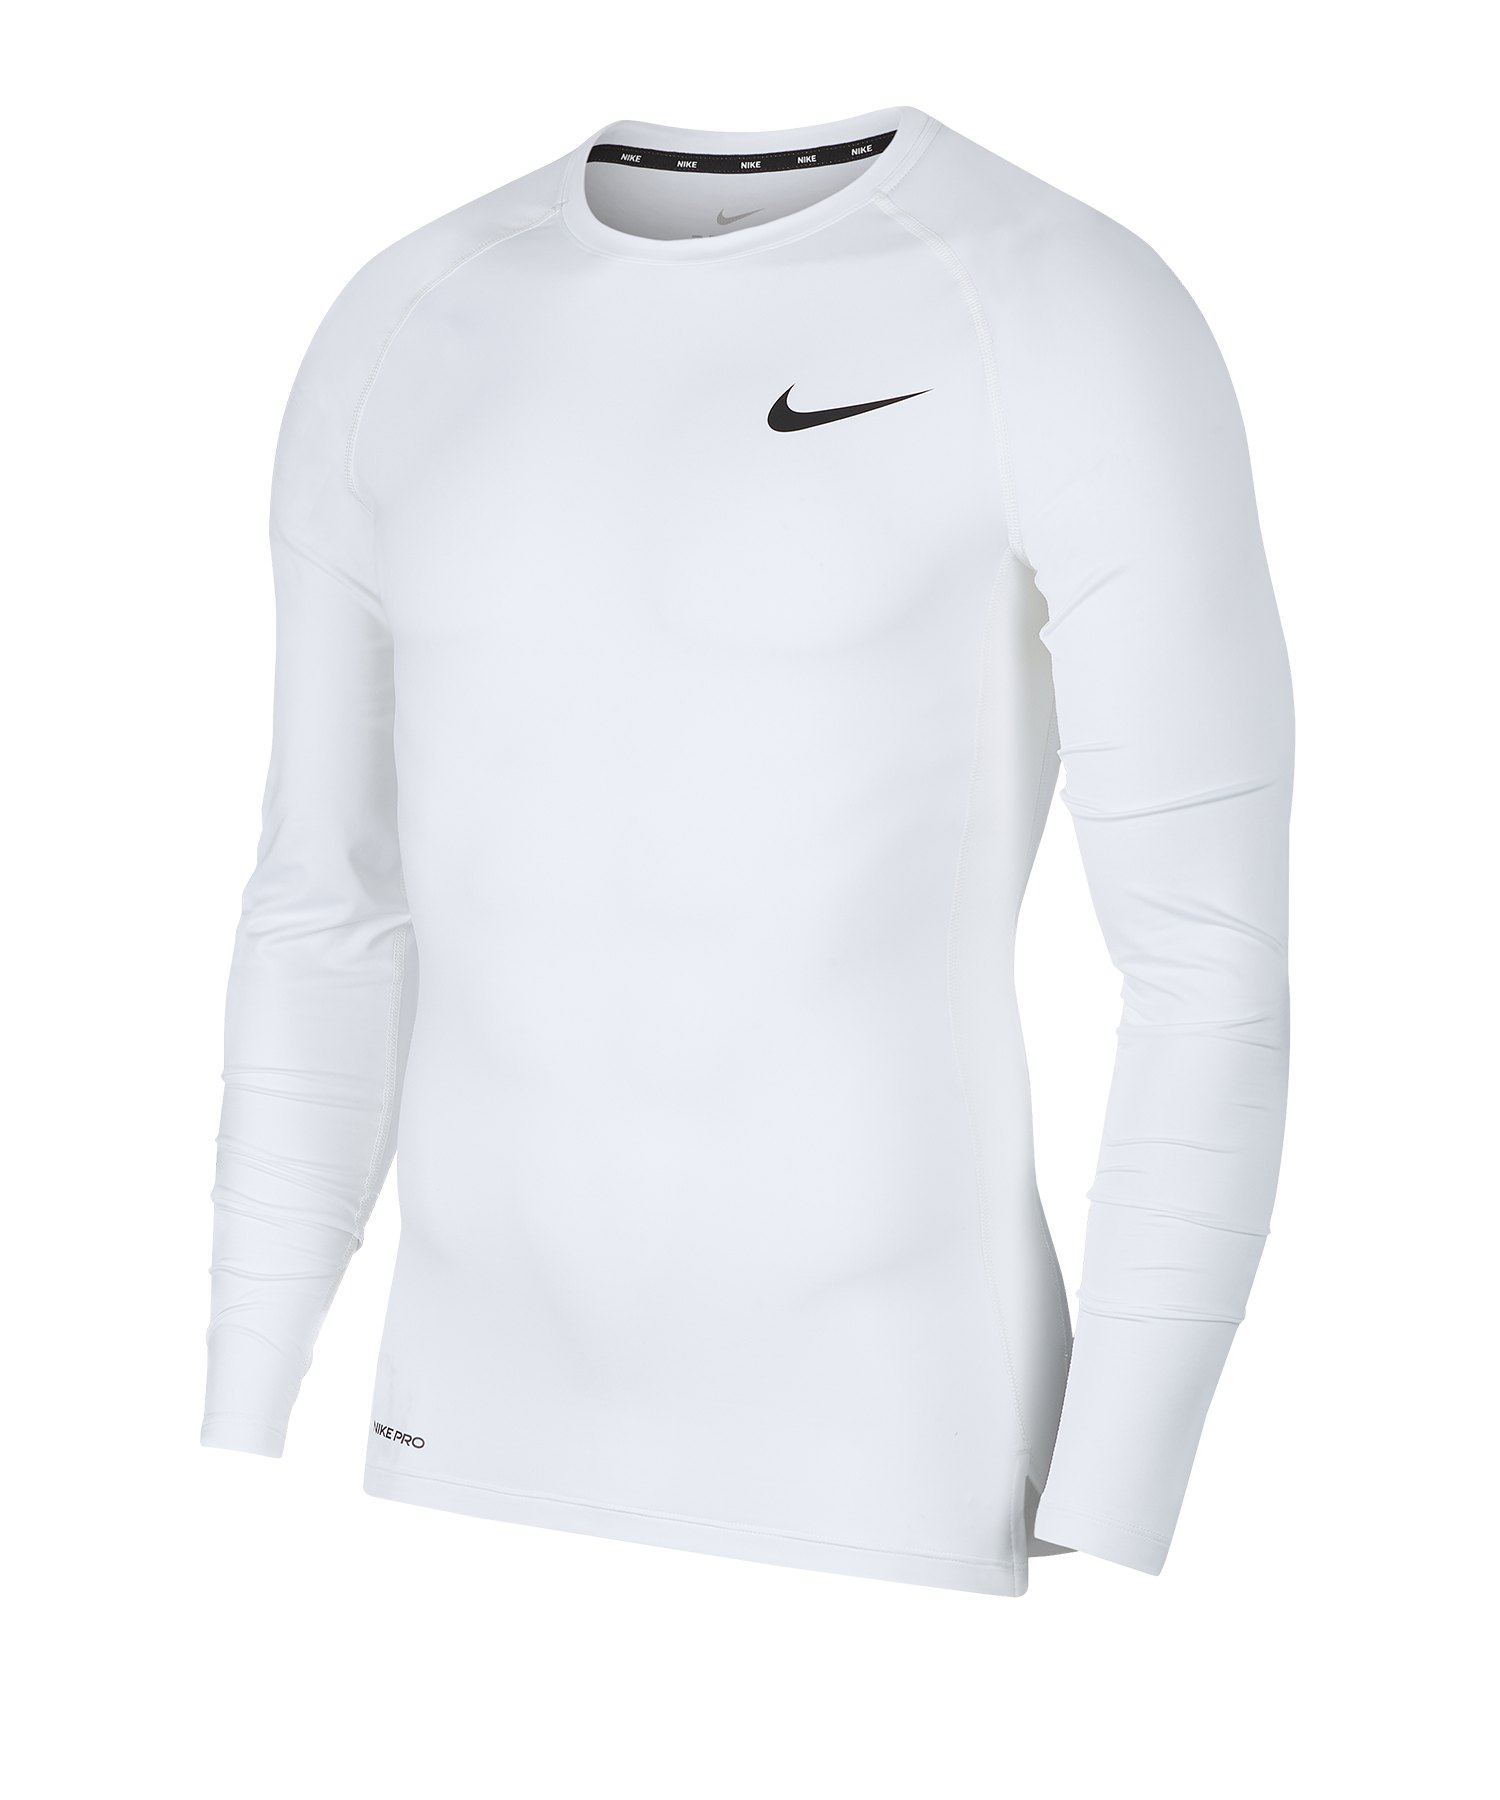 Nike Pro Langarmshirt Weiss F100 - weiss